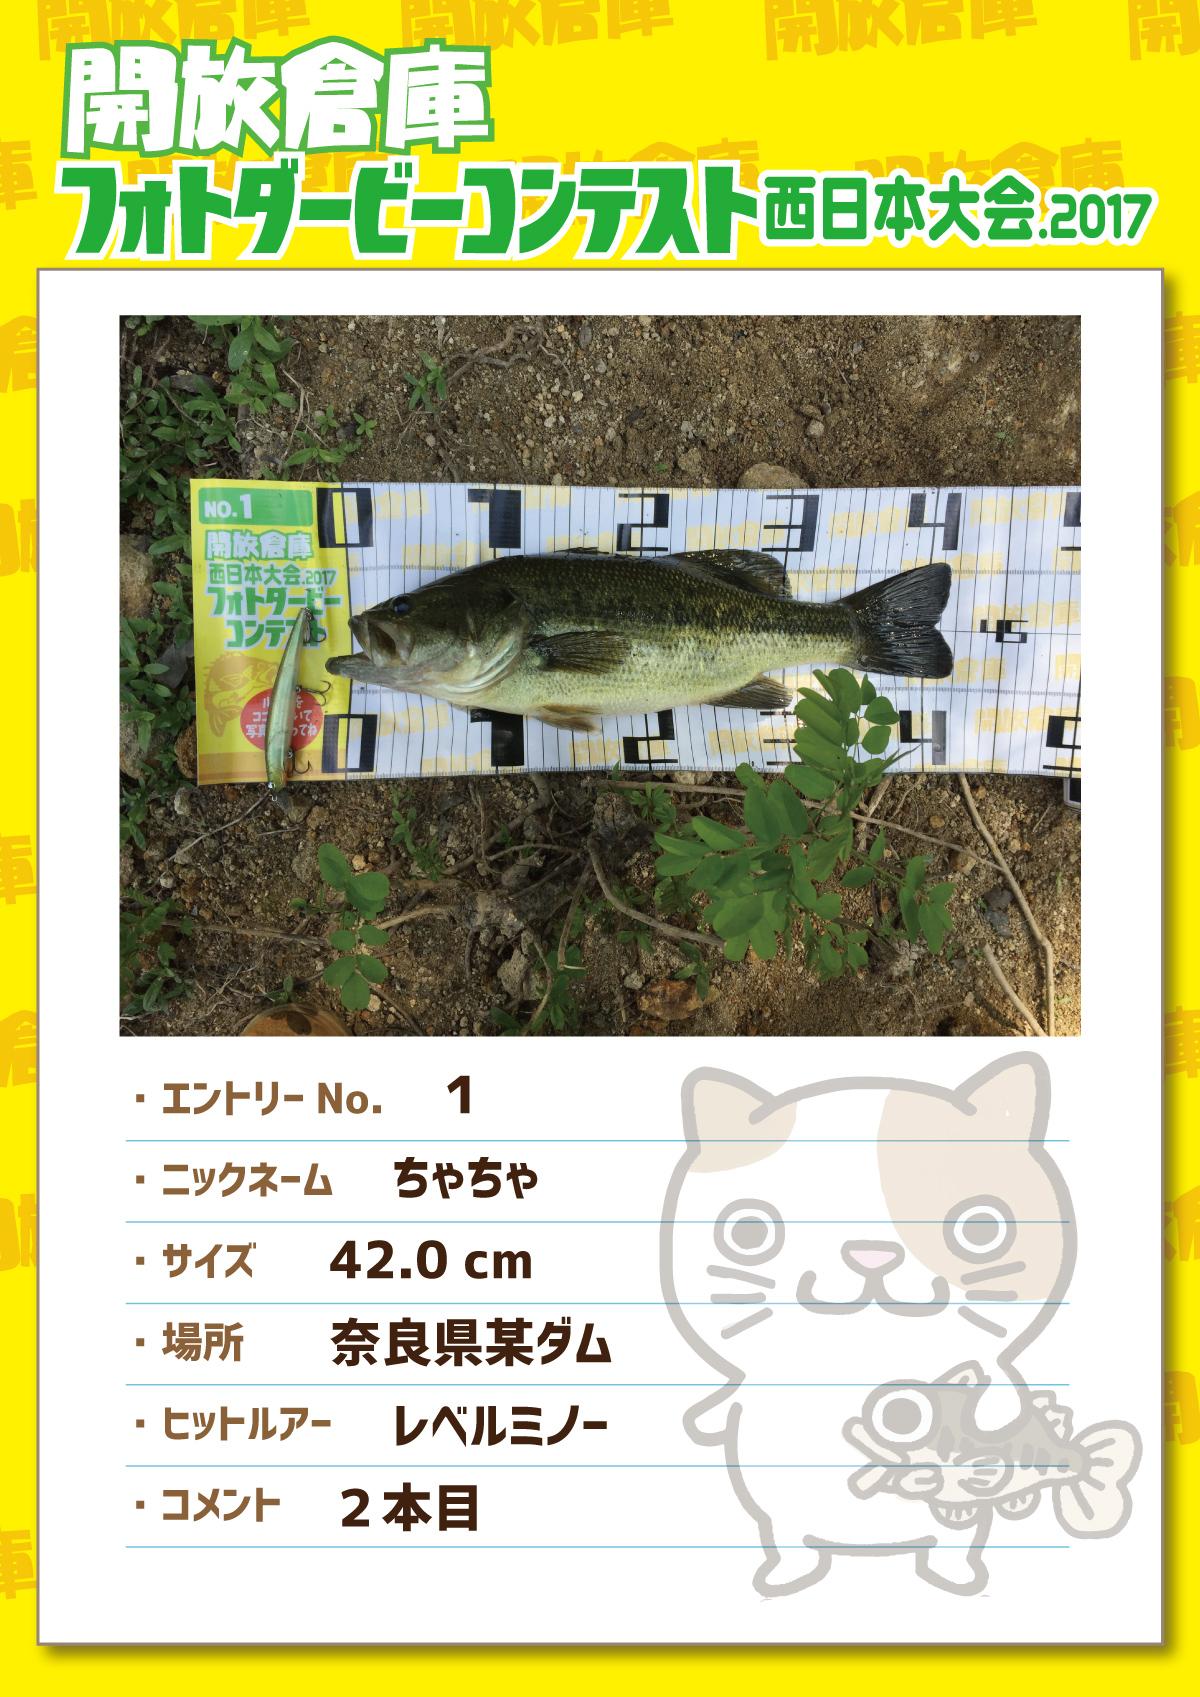 No1 ちゃちゃ 42.0cm 奈良県某ダム レベルミノー 2本目